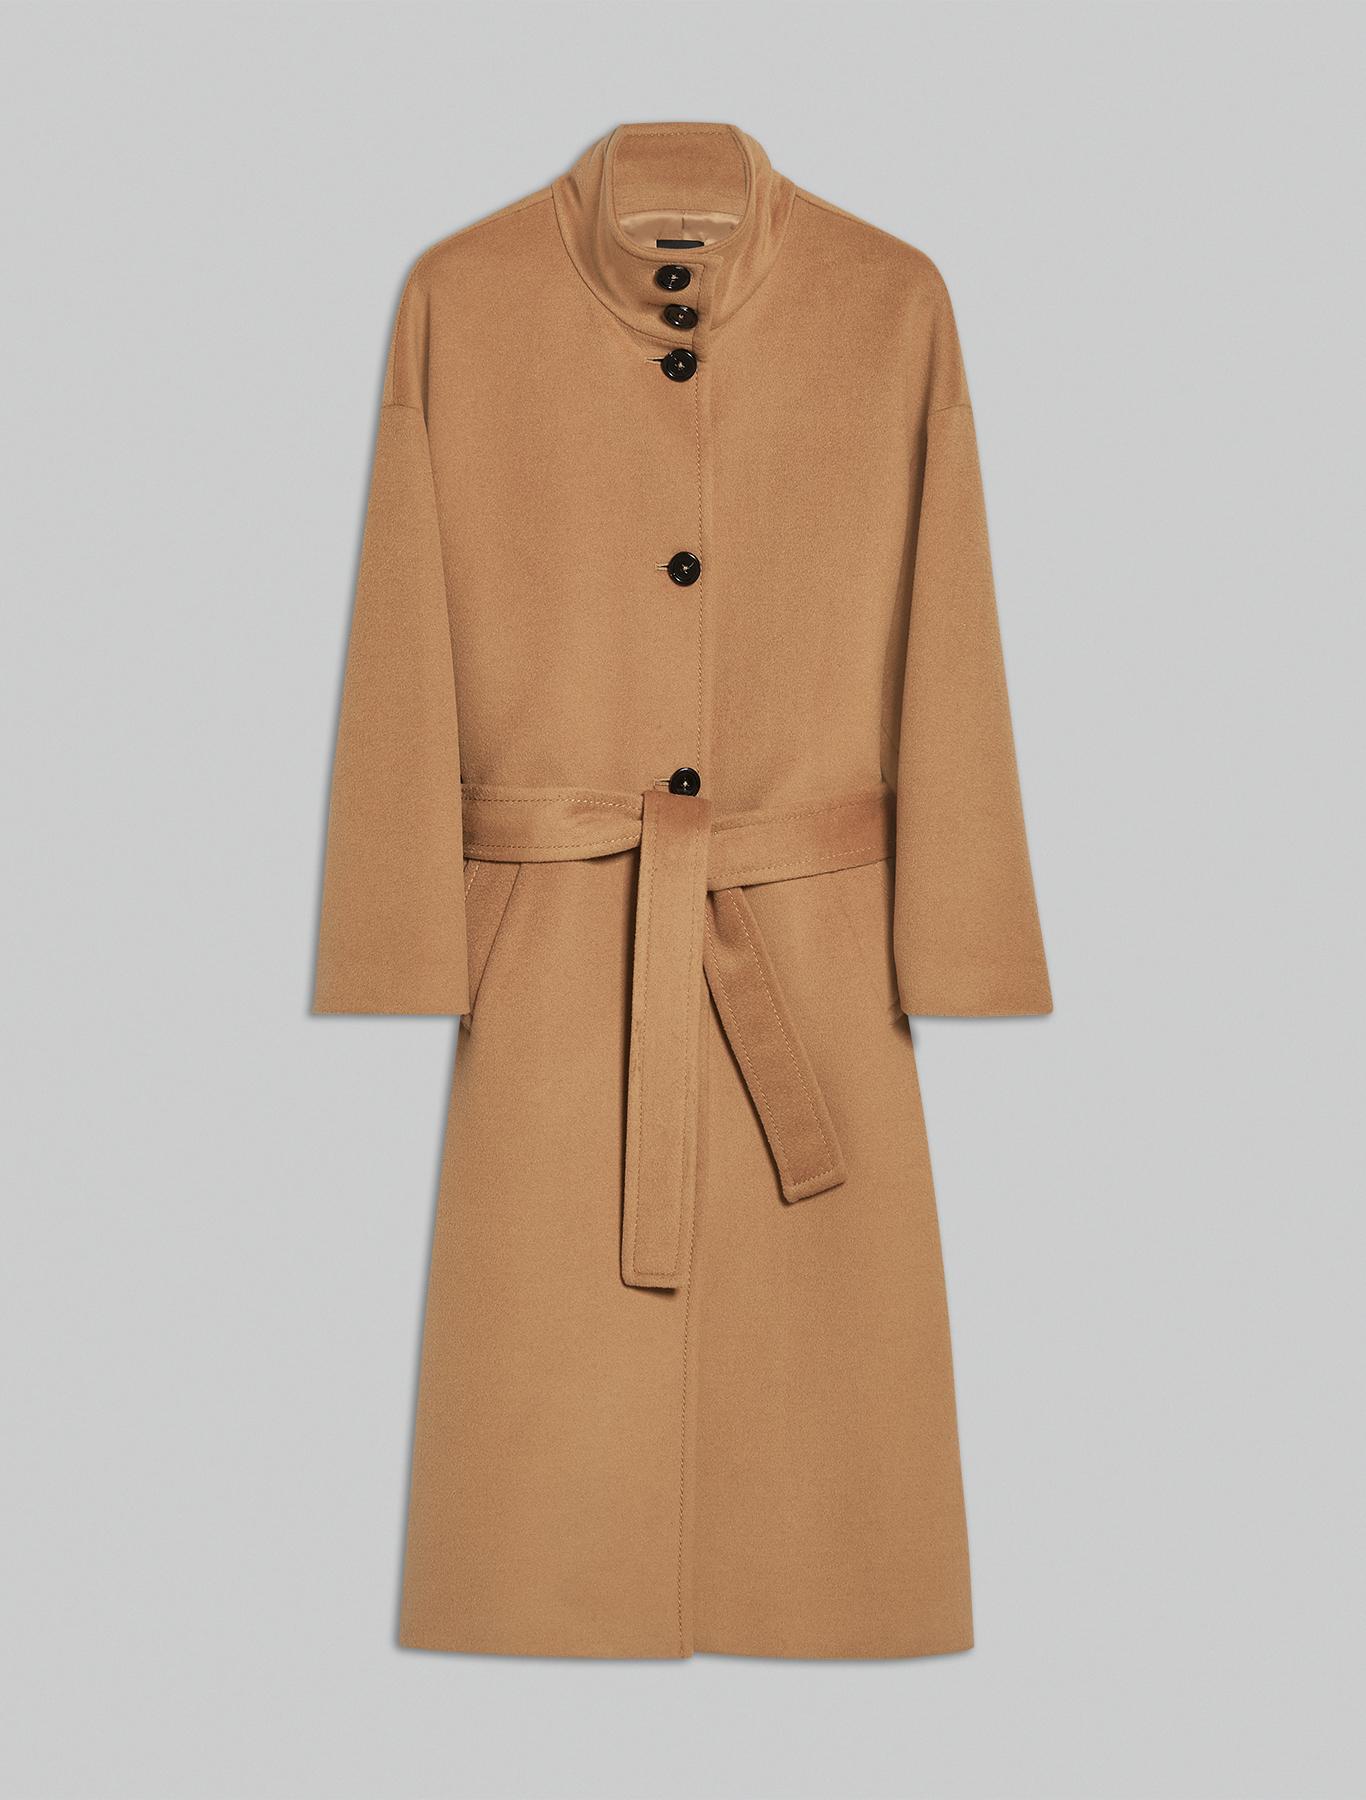 Wool velour coat - camel - pennyblack